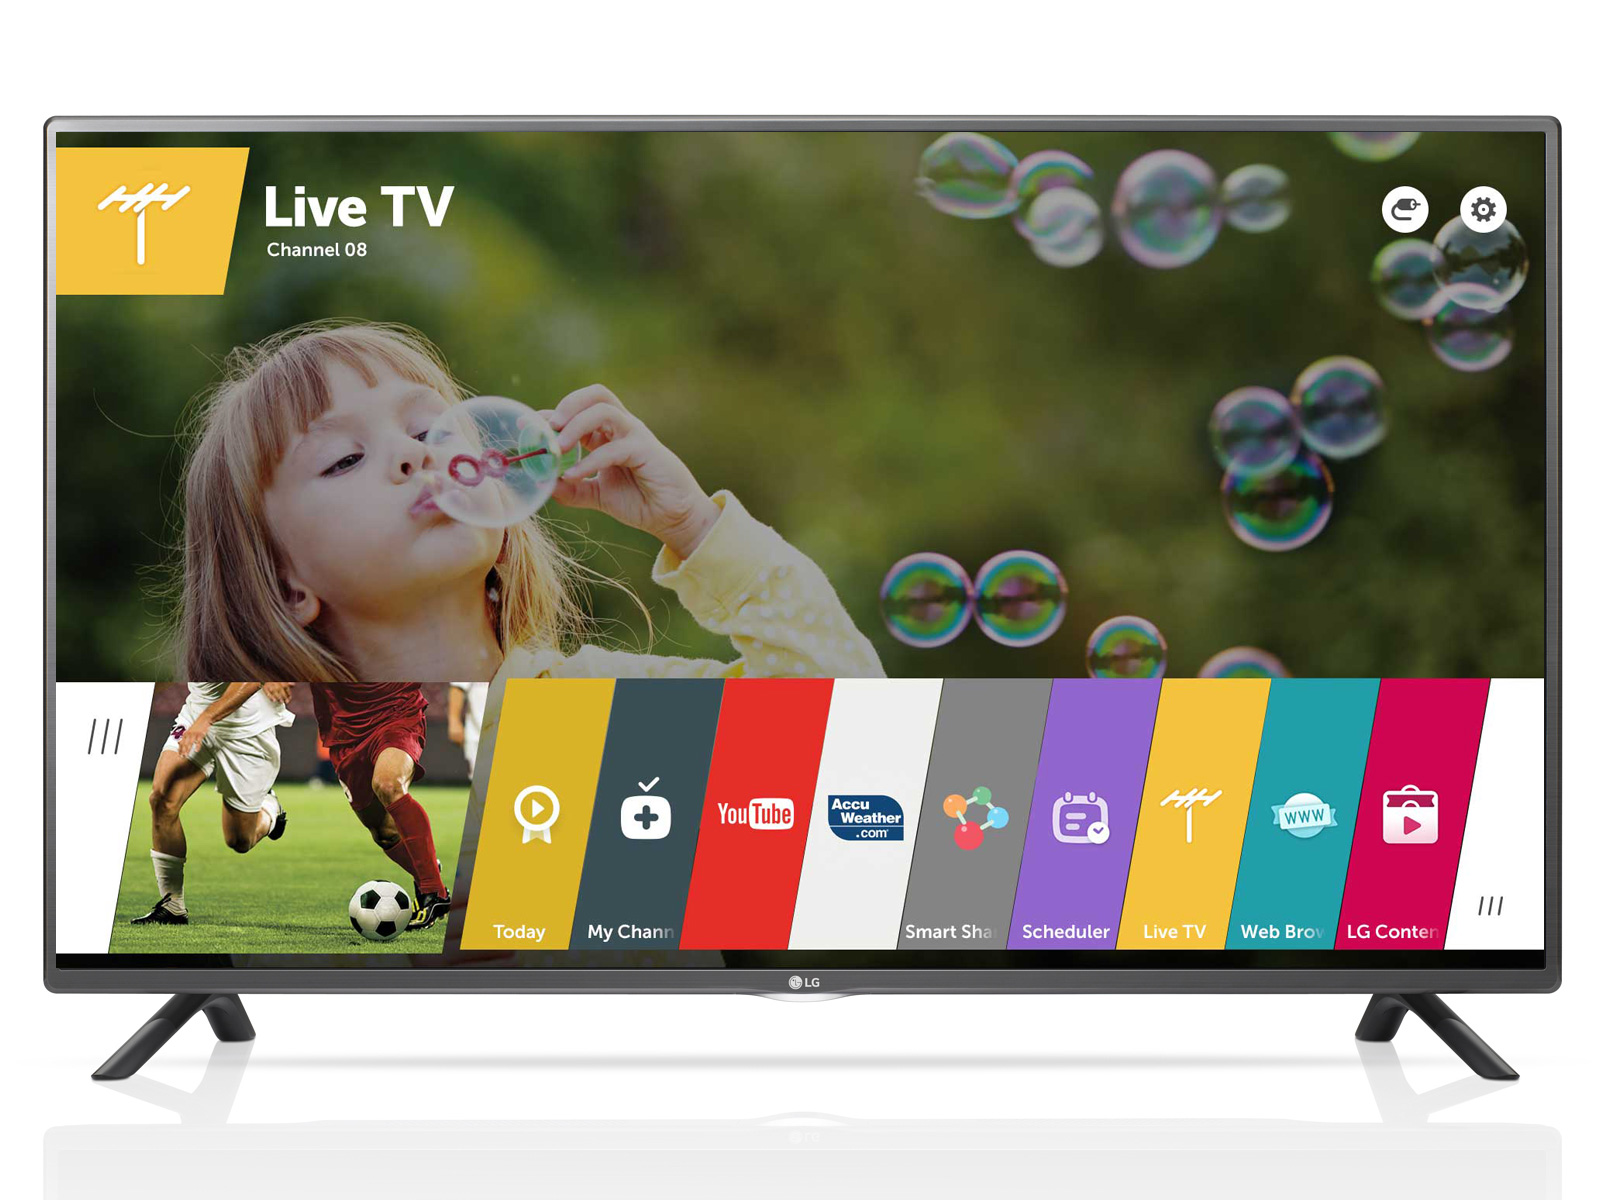 ★杰米家電☆ LG樂金 55LF5950 55吋IPS WEBOS 智慧電視液晶電視